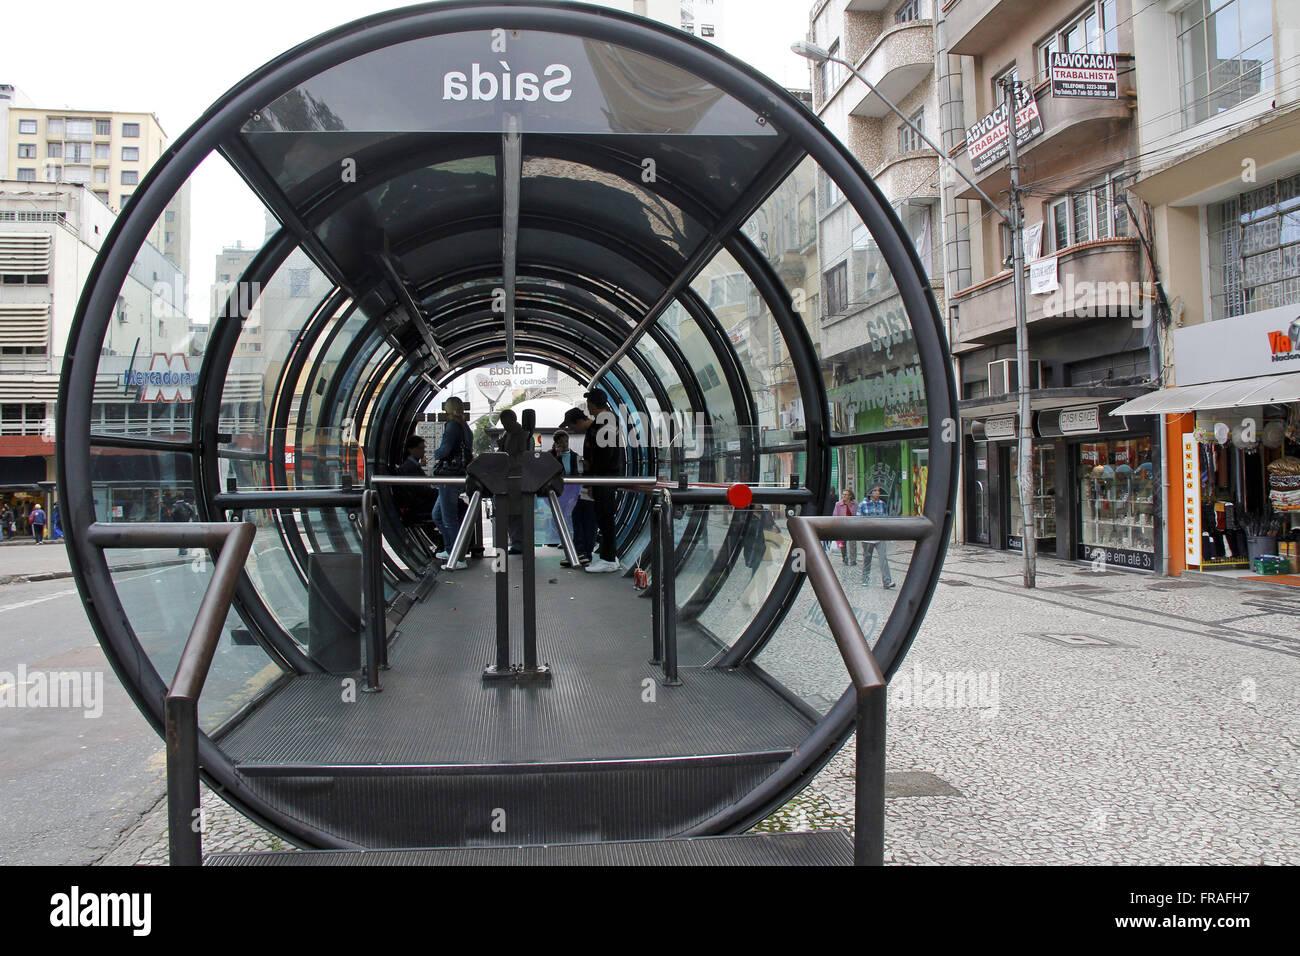 Passengers awaiting the arrival of urban bus tubular season - Stock Image